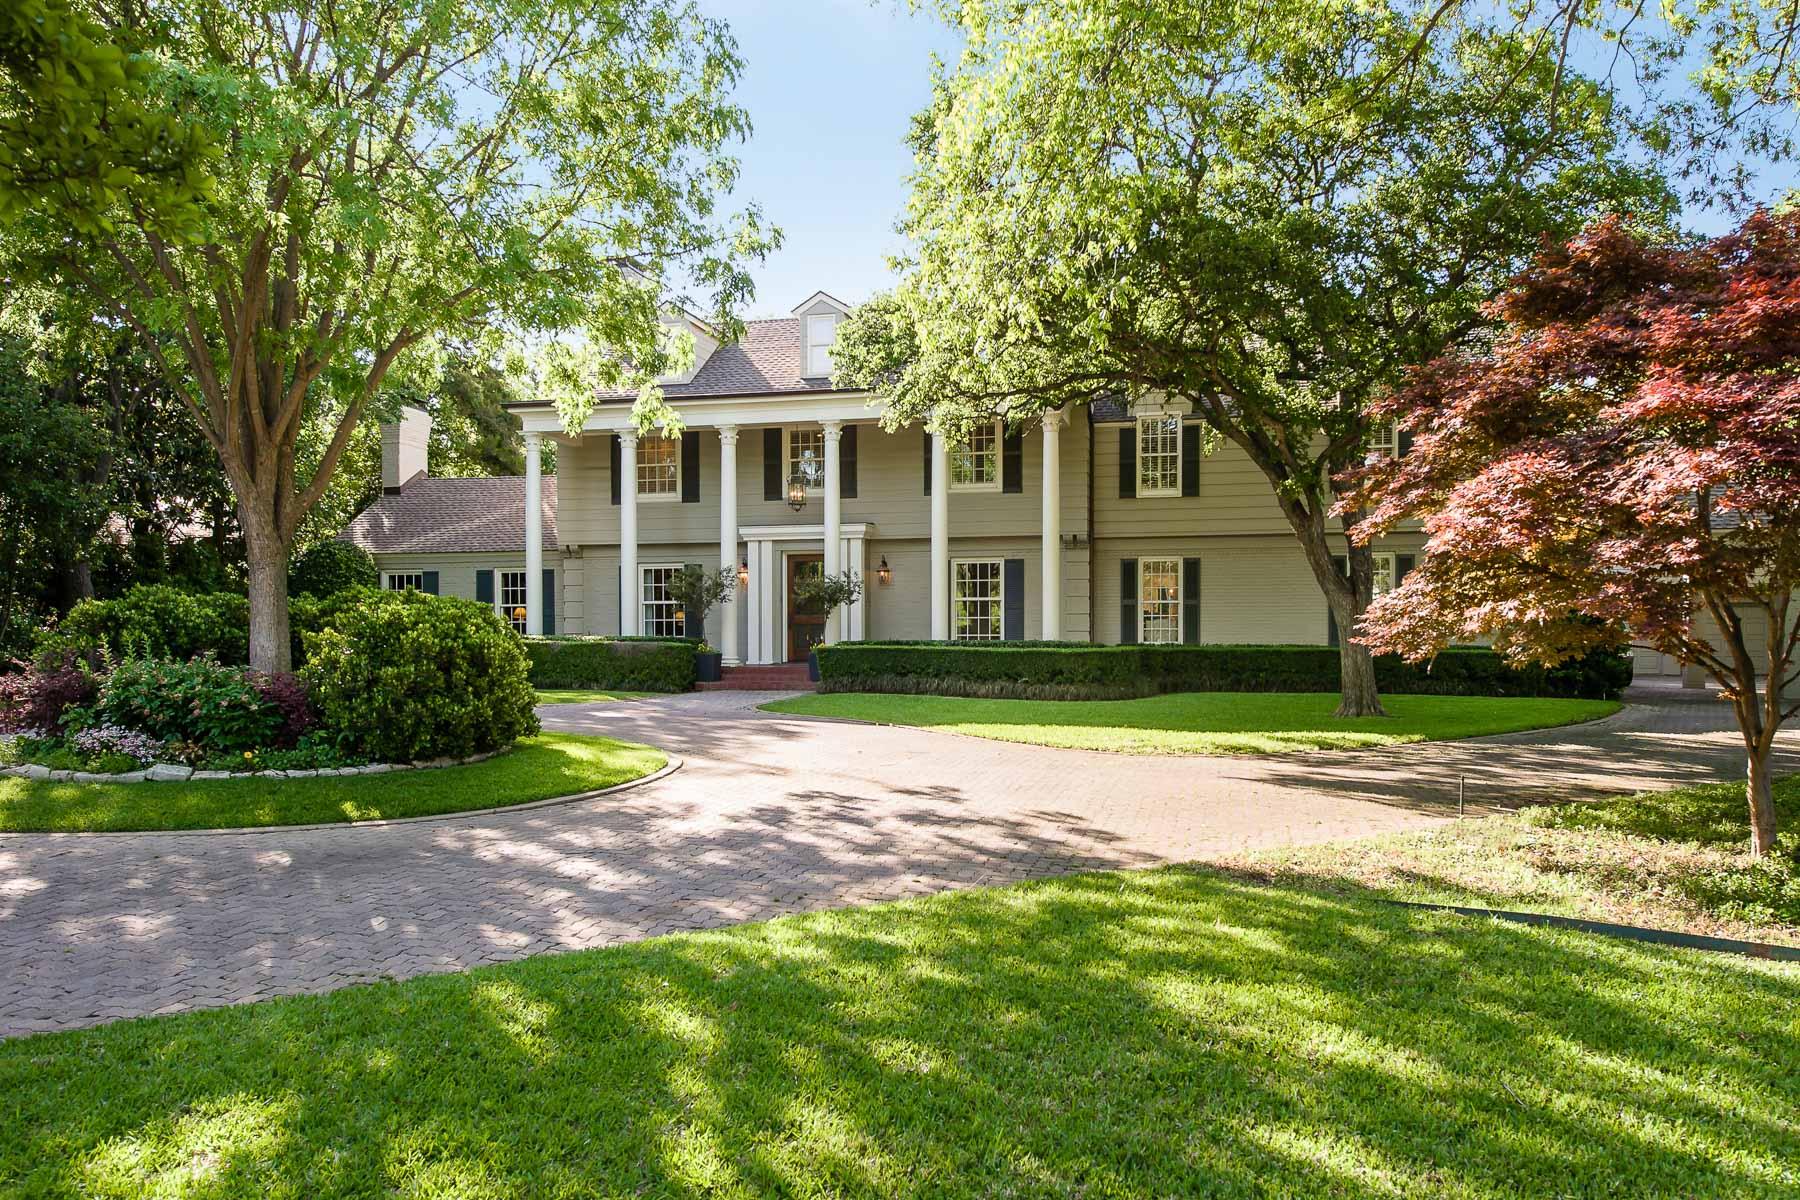 獨棟家庭住宅 為 出售 在 Classic Elegance in Sunnybrook Estates 5022 Shadywood Lane Dallas, 德克薩斯州, 75209 美國